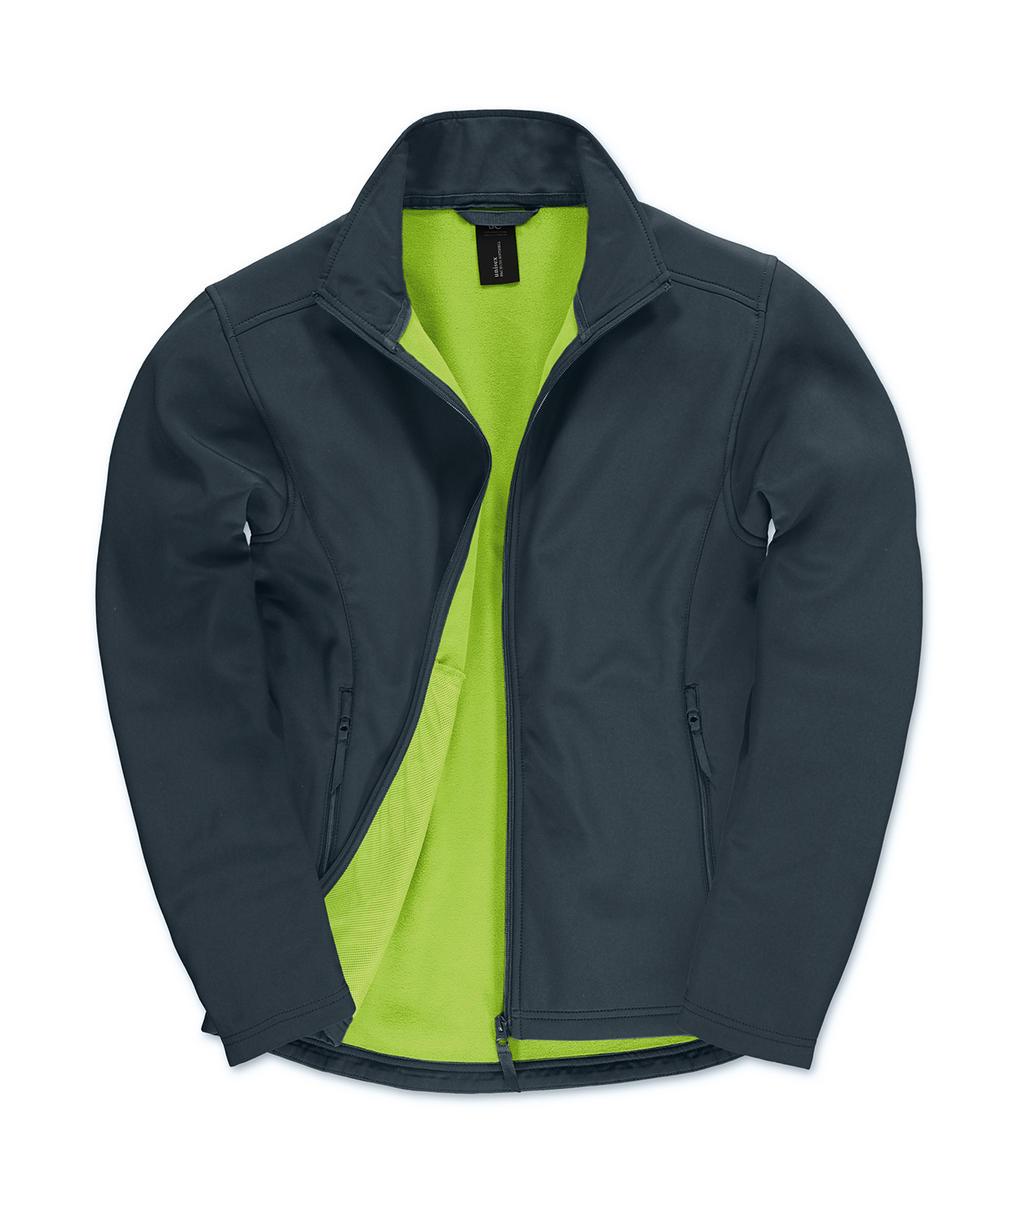 b c softshelljacke jacke jacket softshell s m l xl xxl 3xl neu ebay. Black Bedroom Furniture Sets. Home Design Ideas